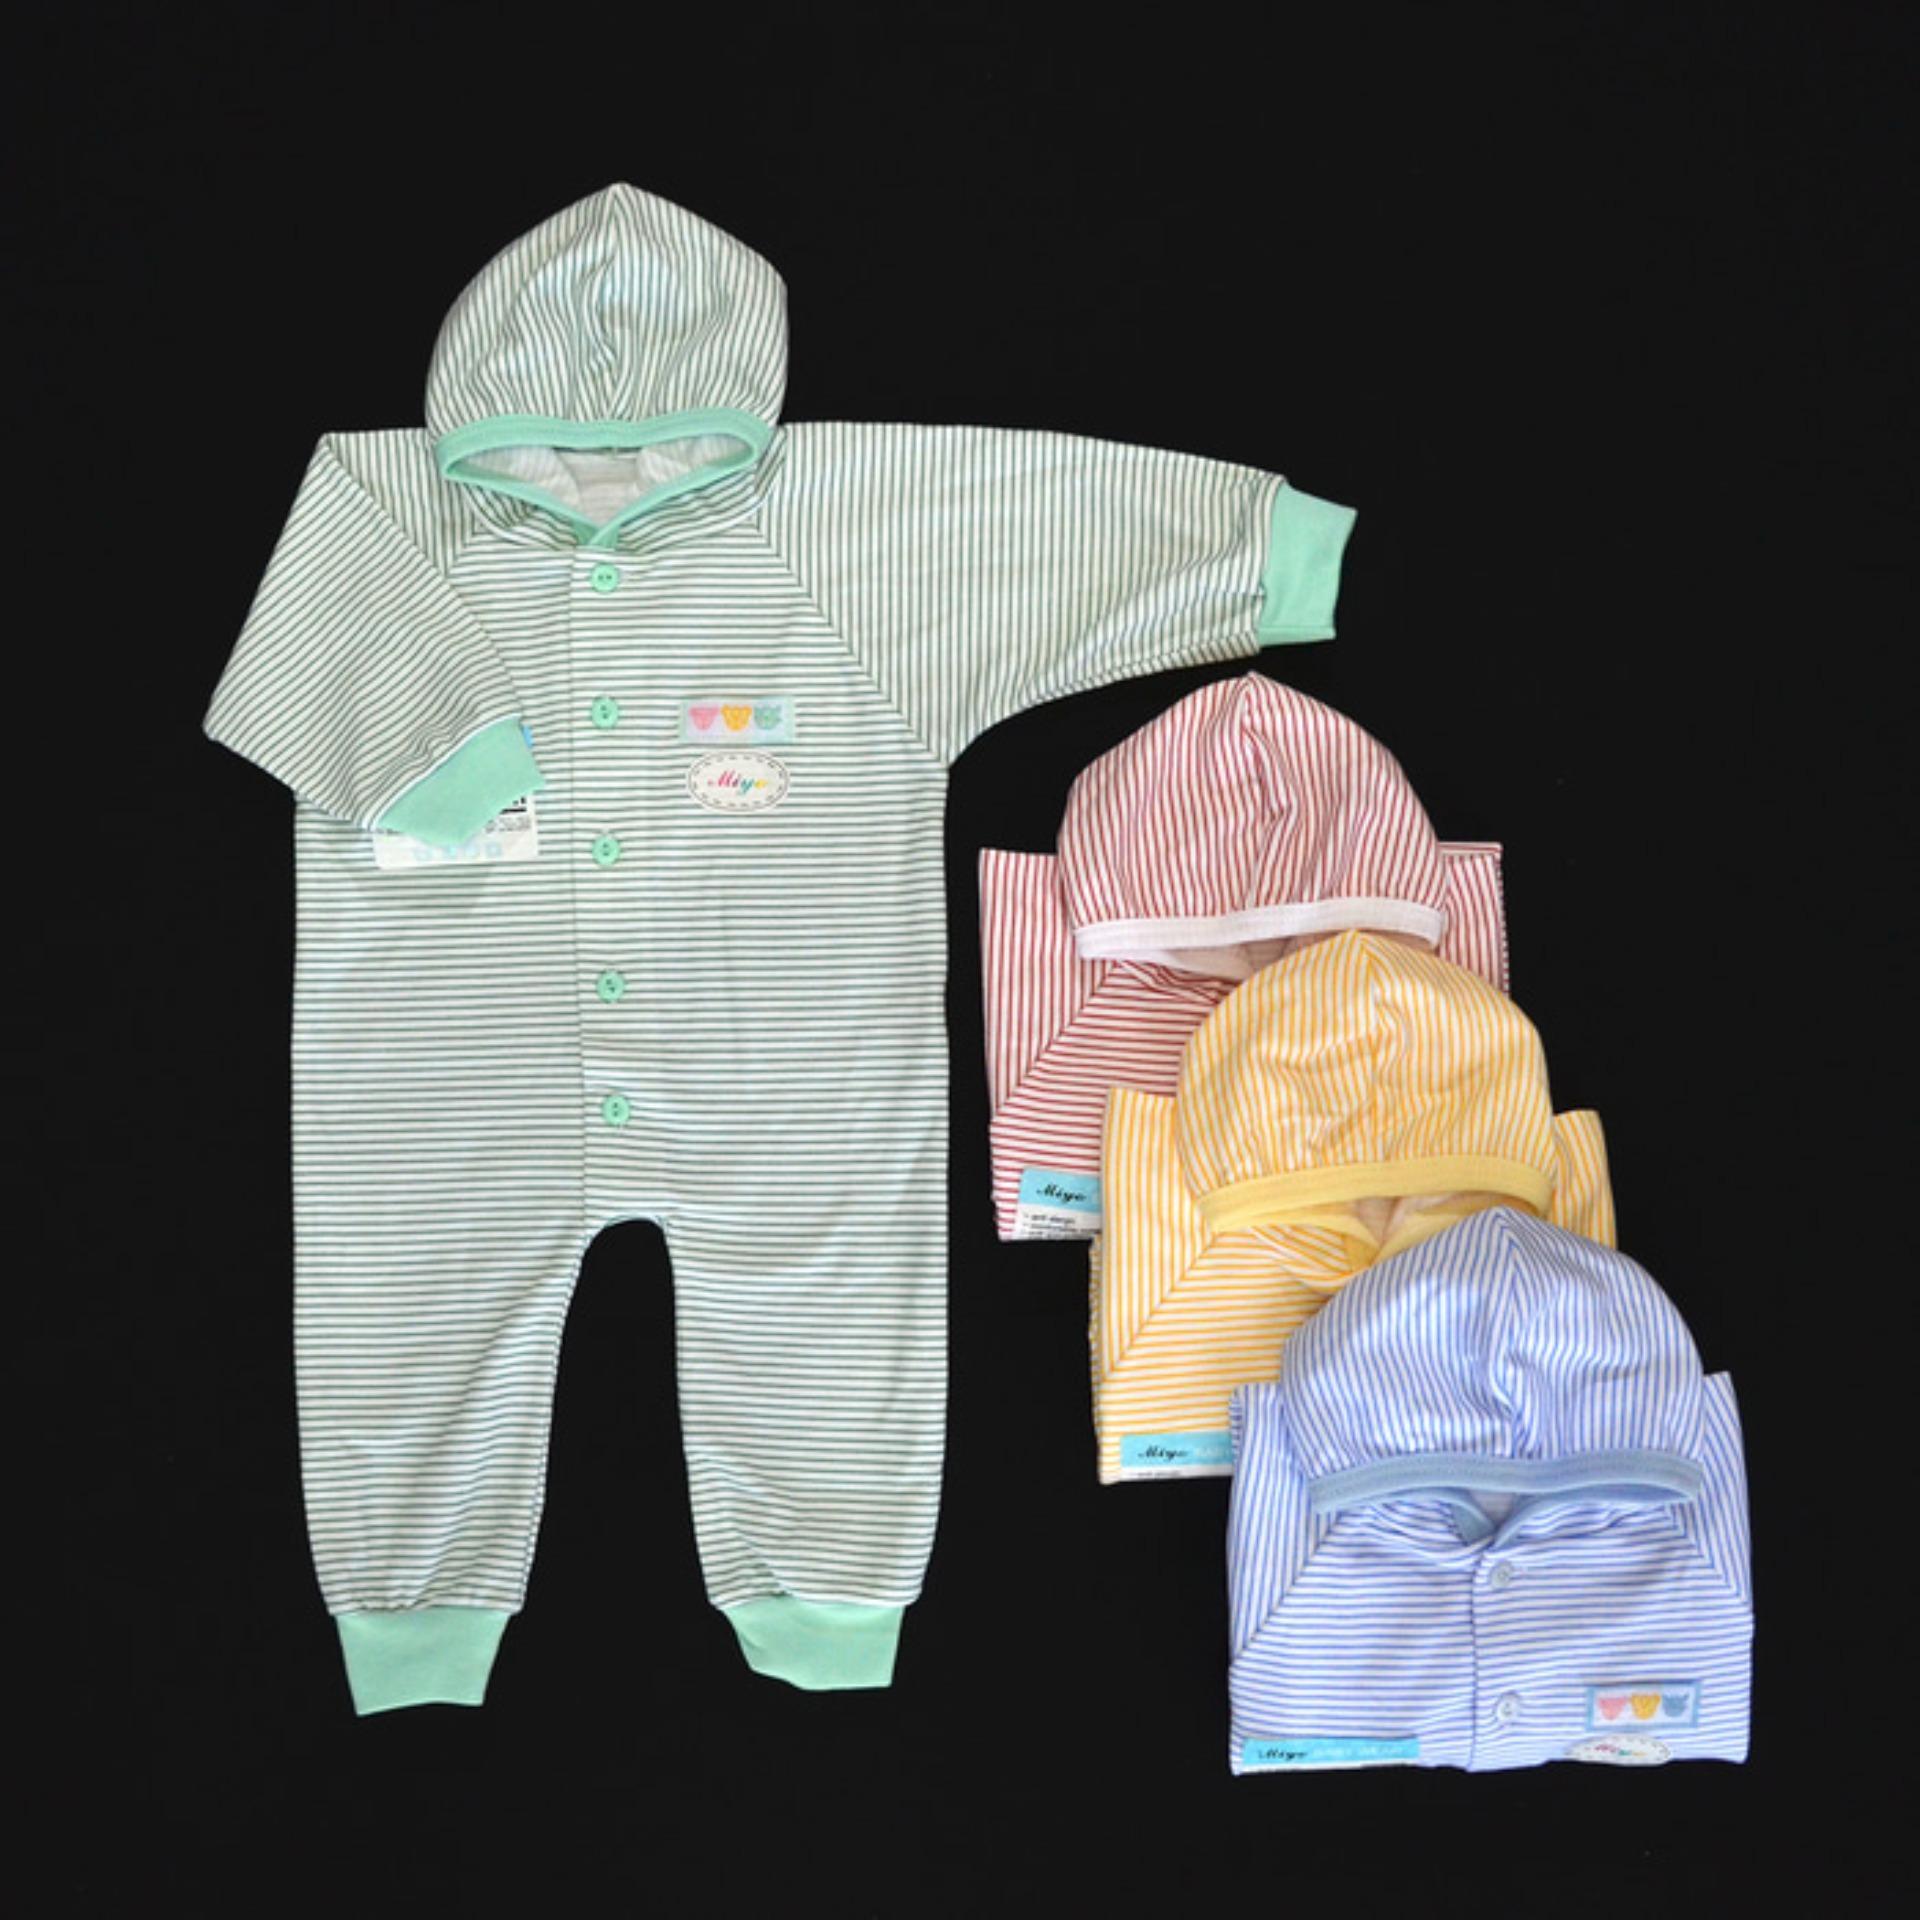 MIYO Baju Kodok Panjang Topi Buka Kaki Bayi/Baby Salur Newborn (0-3M), baju bayi murah